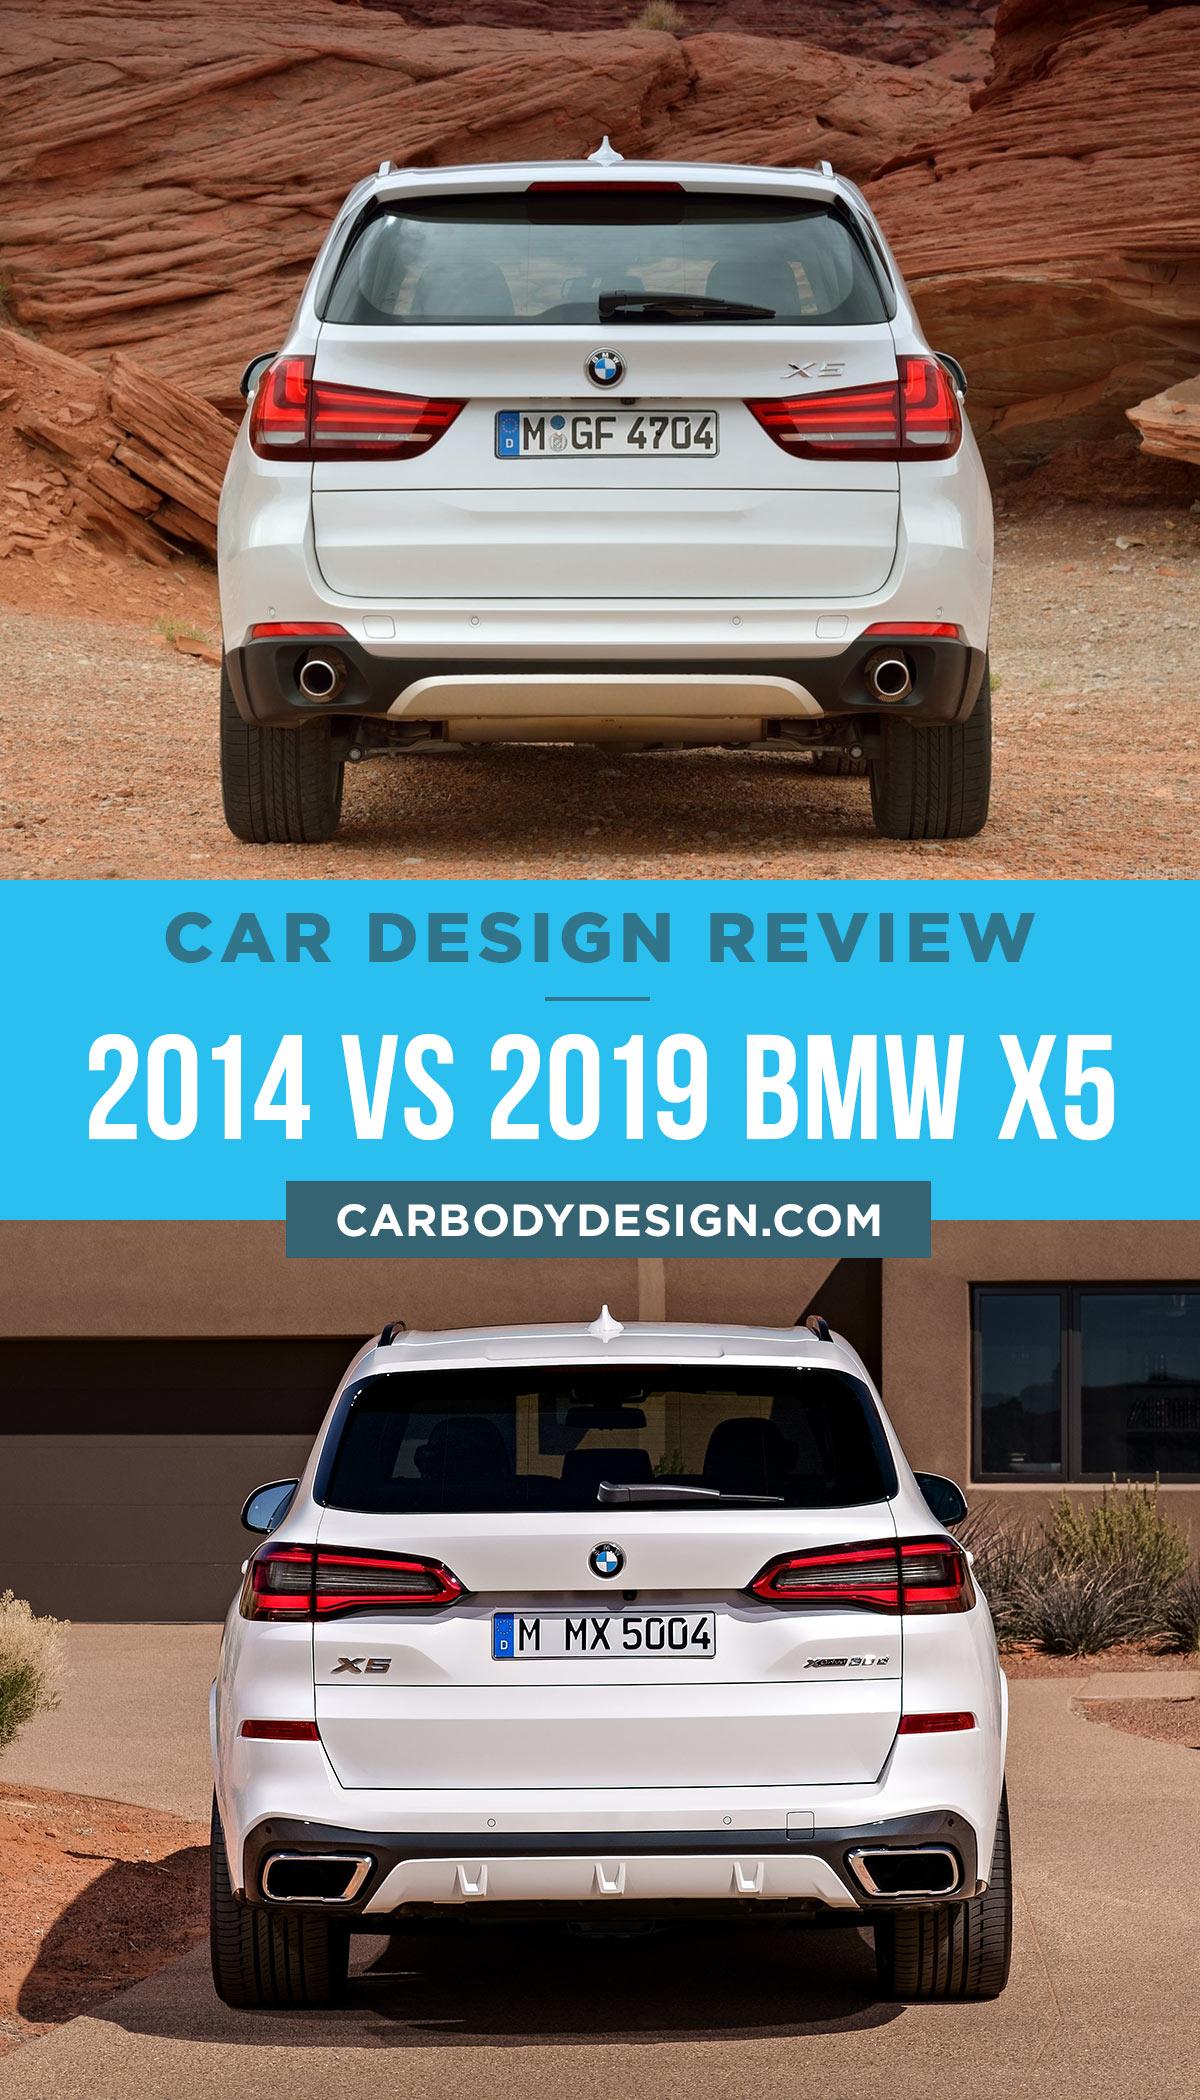 2014 Vs 2019 Bmw X5 Rear View Design Car Body Design